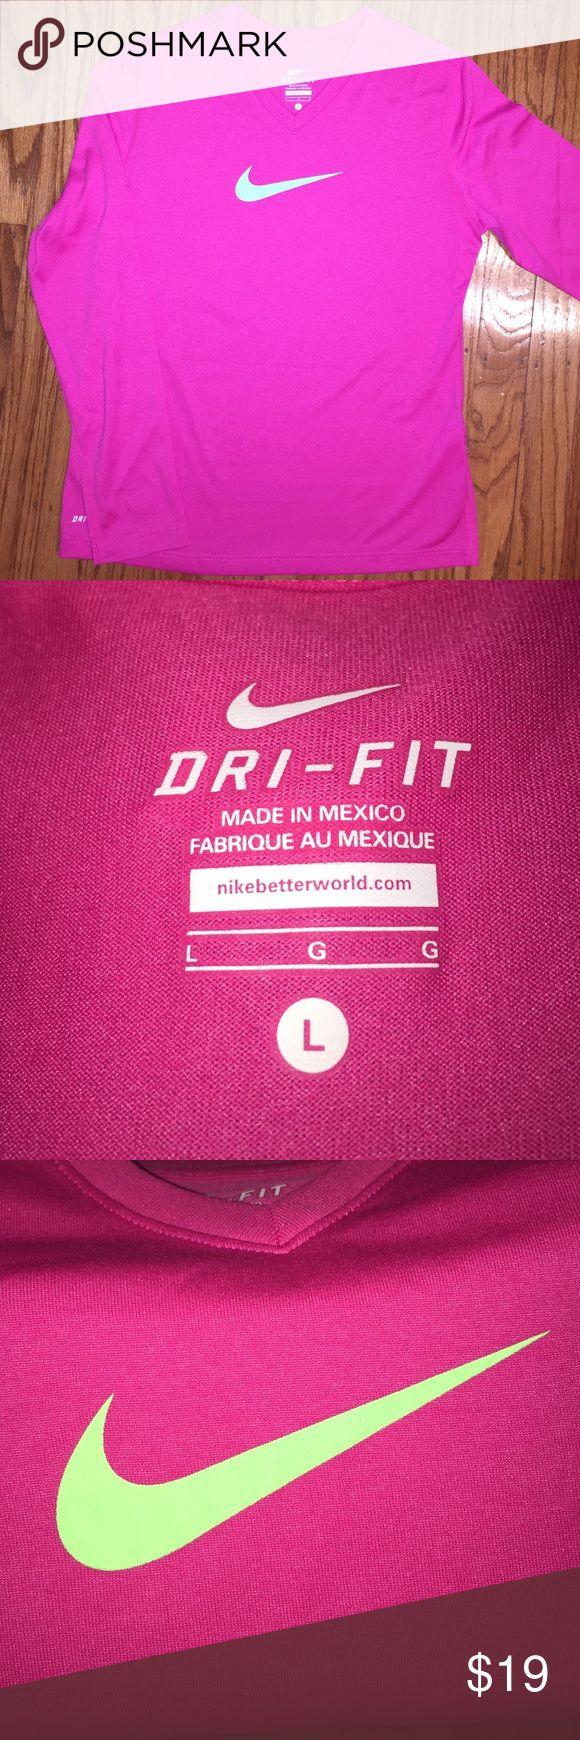 Price⬇️NIKE Girls Long Sleeve T. Size Large NIKE Dri-Fit Pink/Green Long Sleeve Tshirt. Size Large Nike Shirts & Tops Tees - Long Sleeve